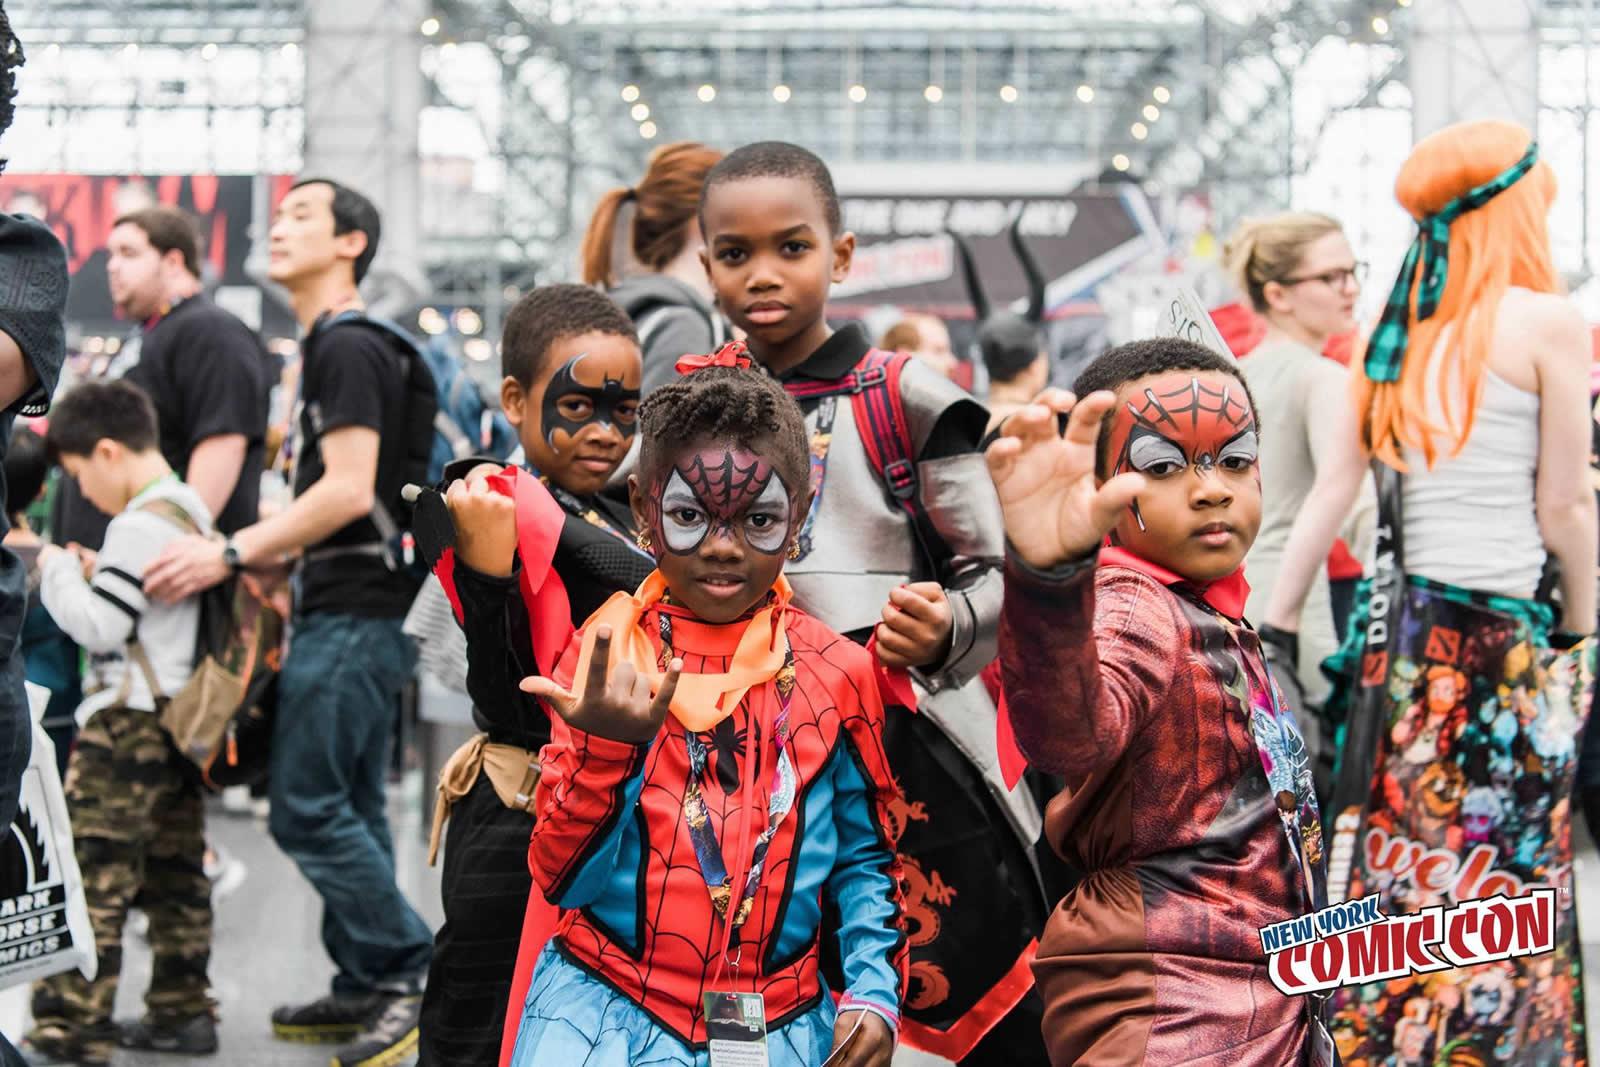 New York Comic Con  Convention de BD mangas jeux vidos cosplay